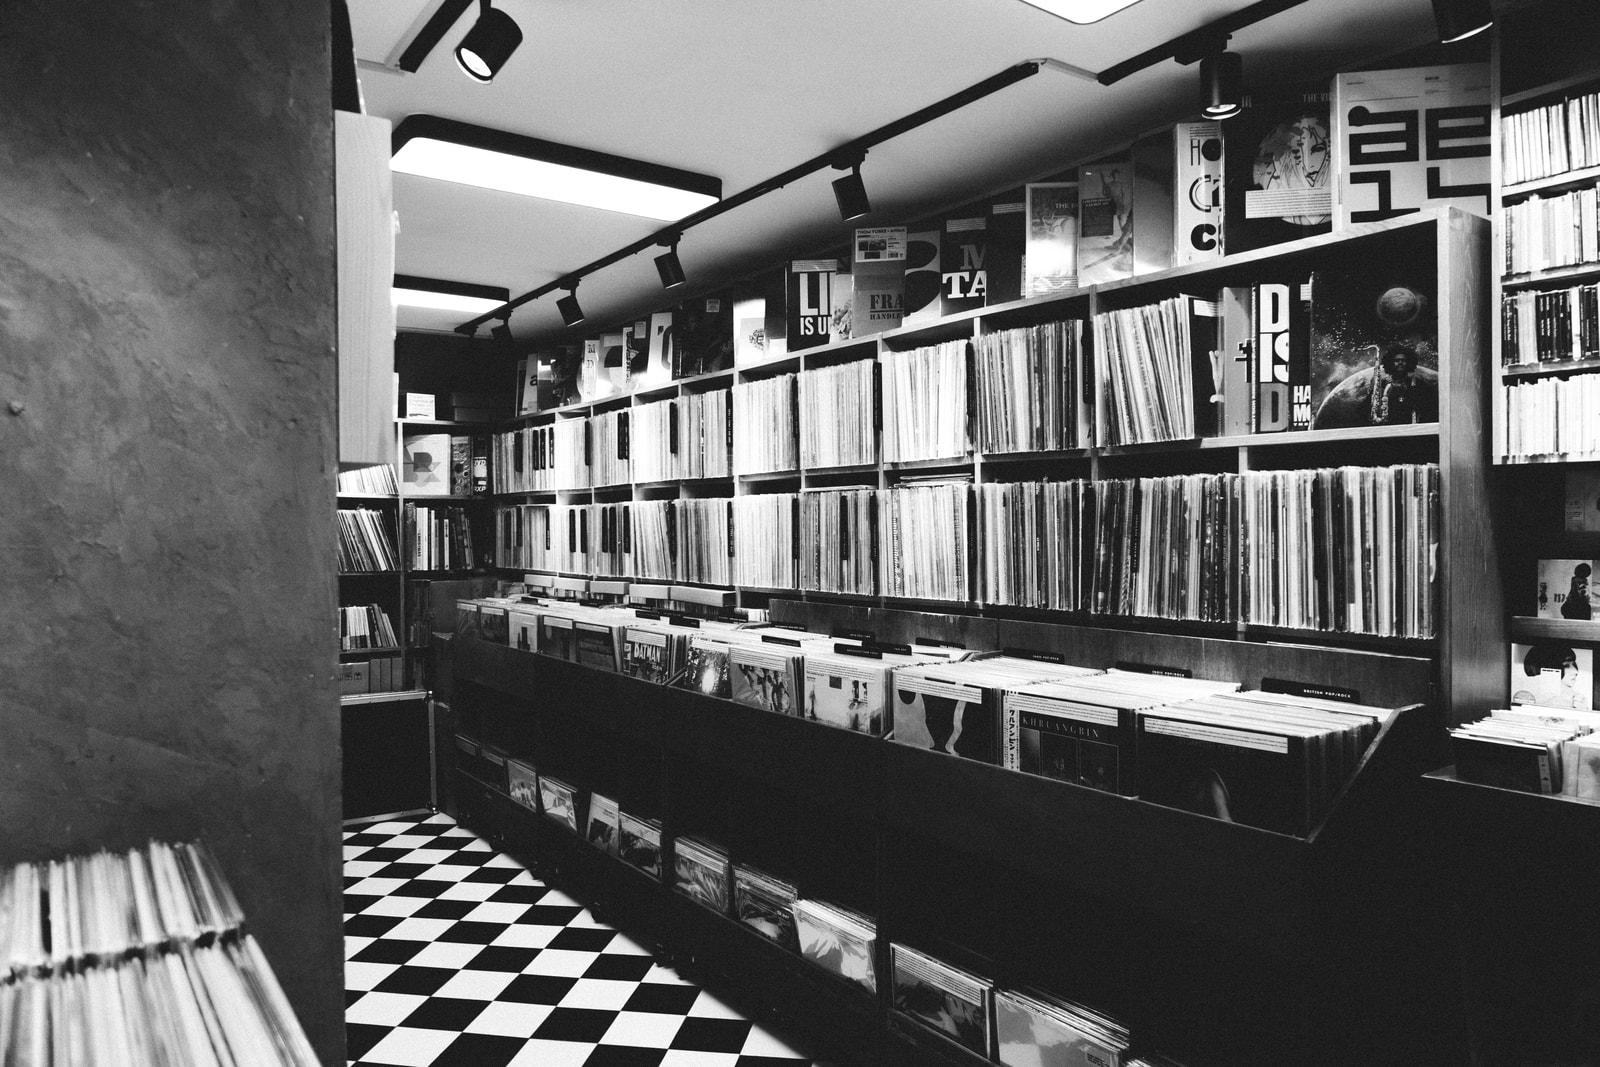 HYPEBEAST 獨家專訪 TYNT : 沒有音樂我甚麼也不是。